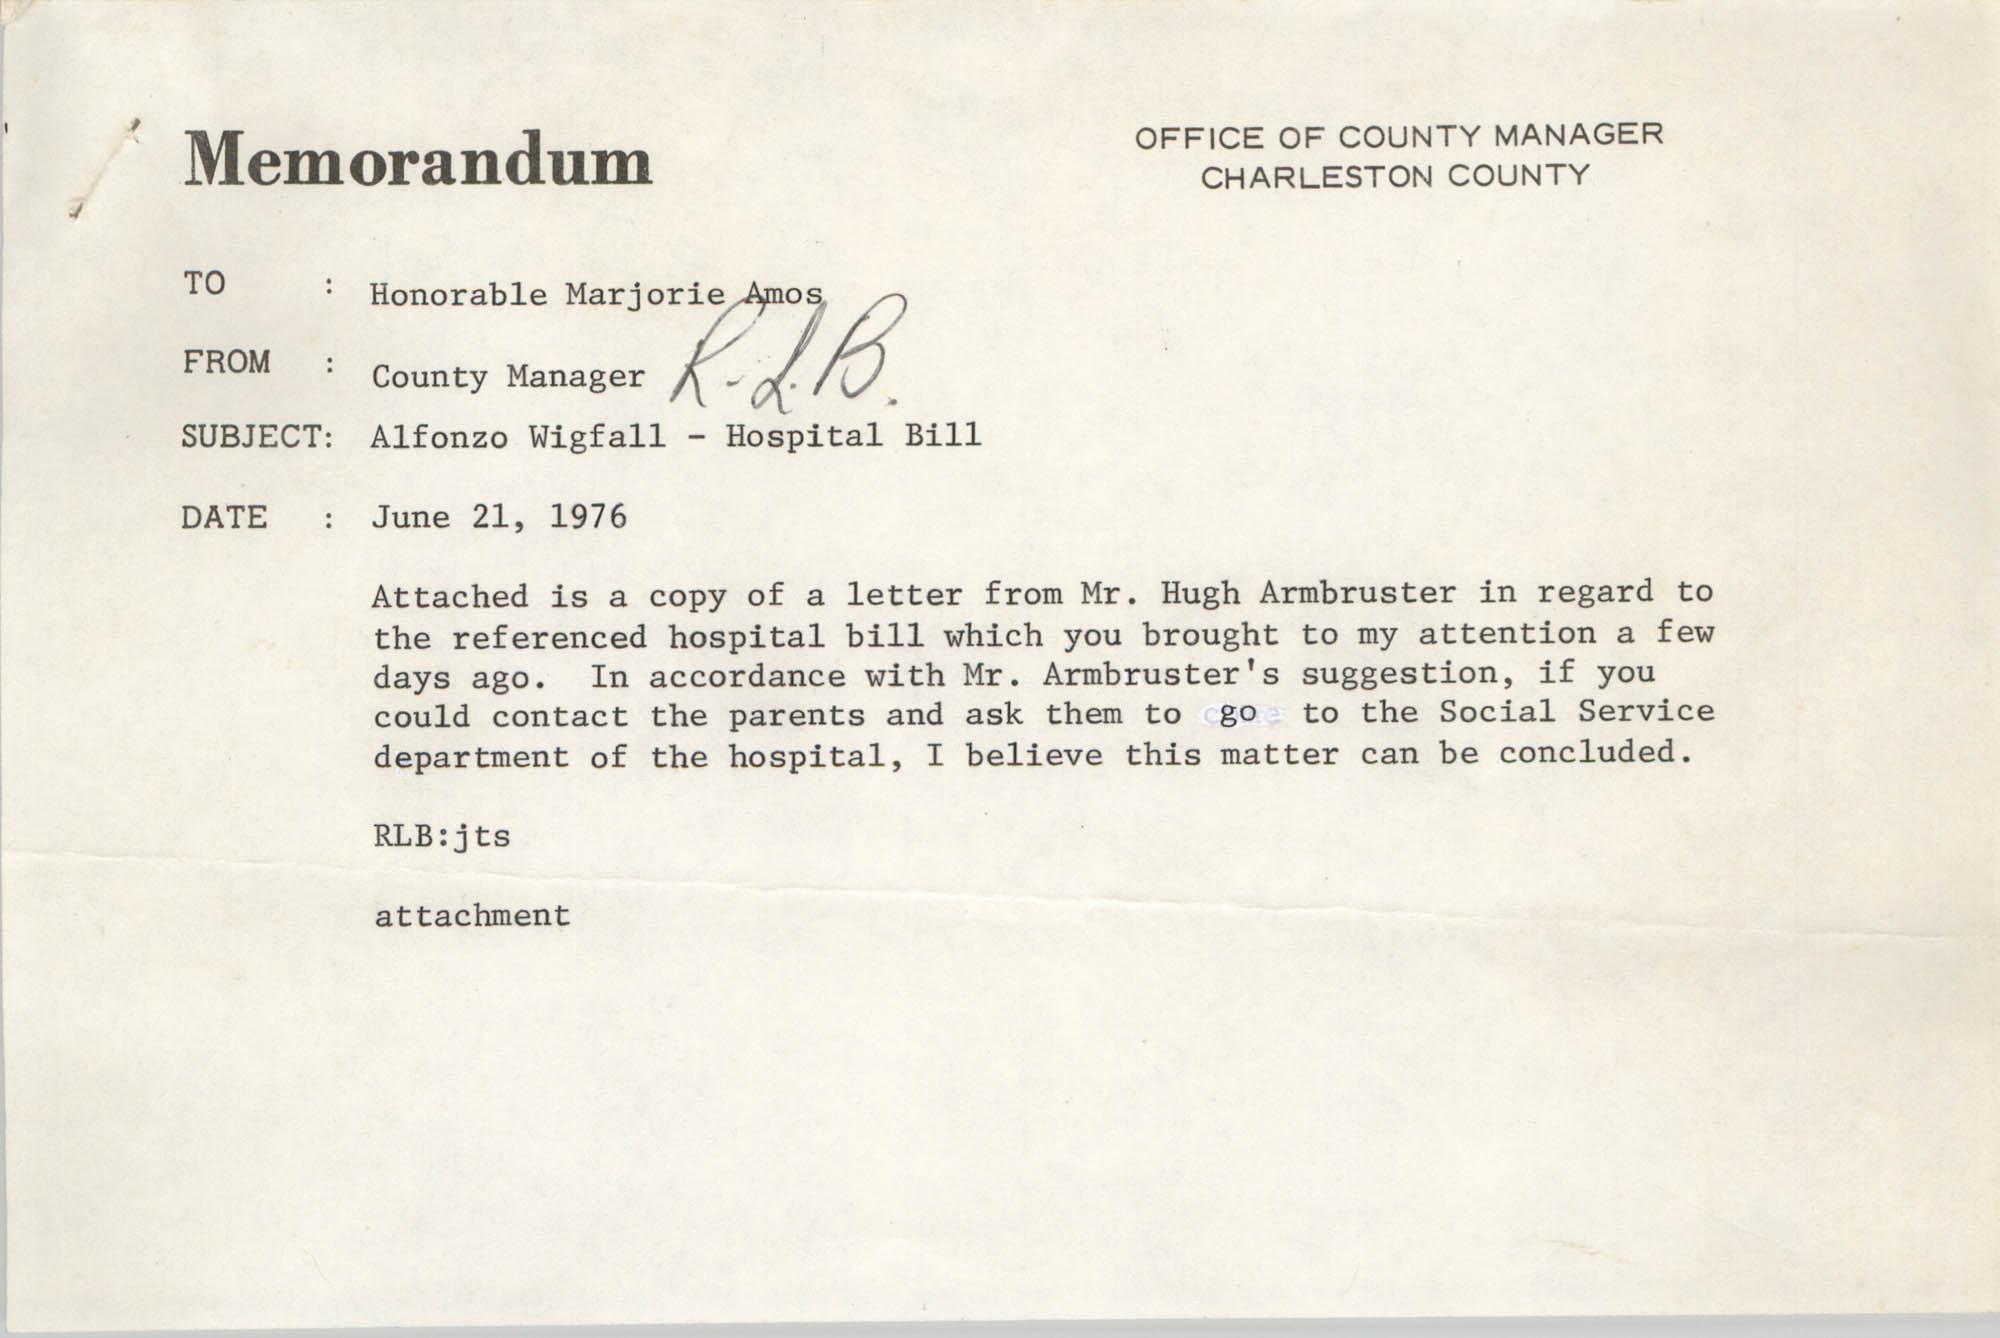 Memorandum, June 21, 1976